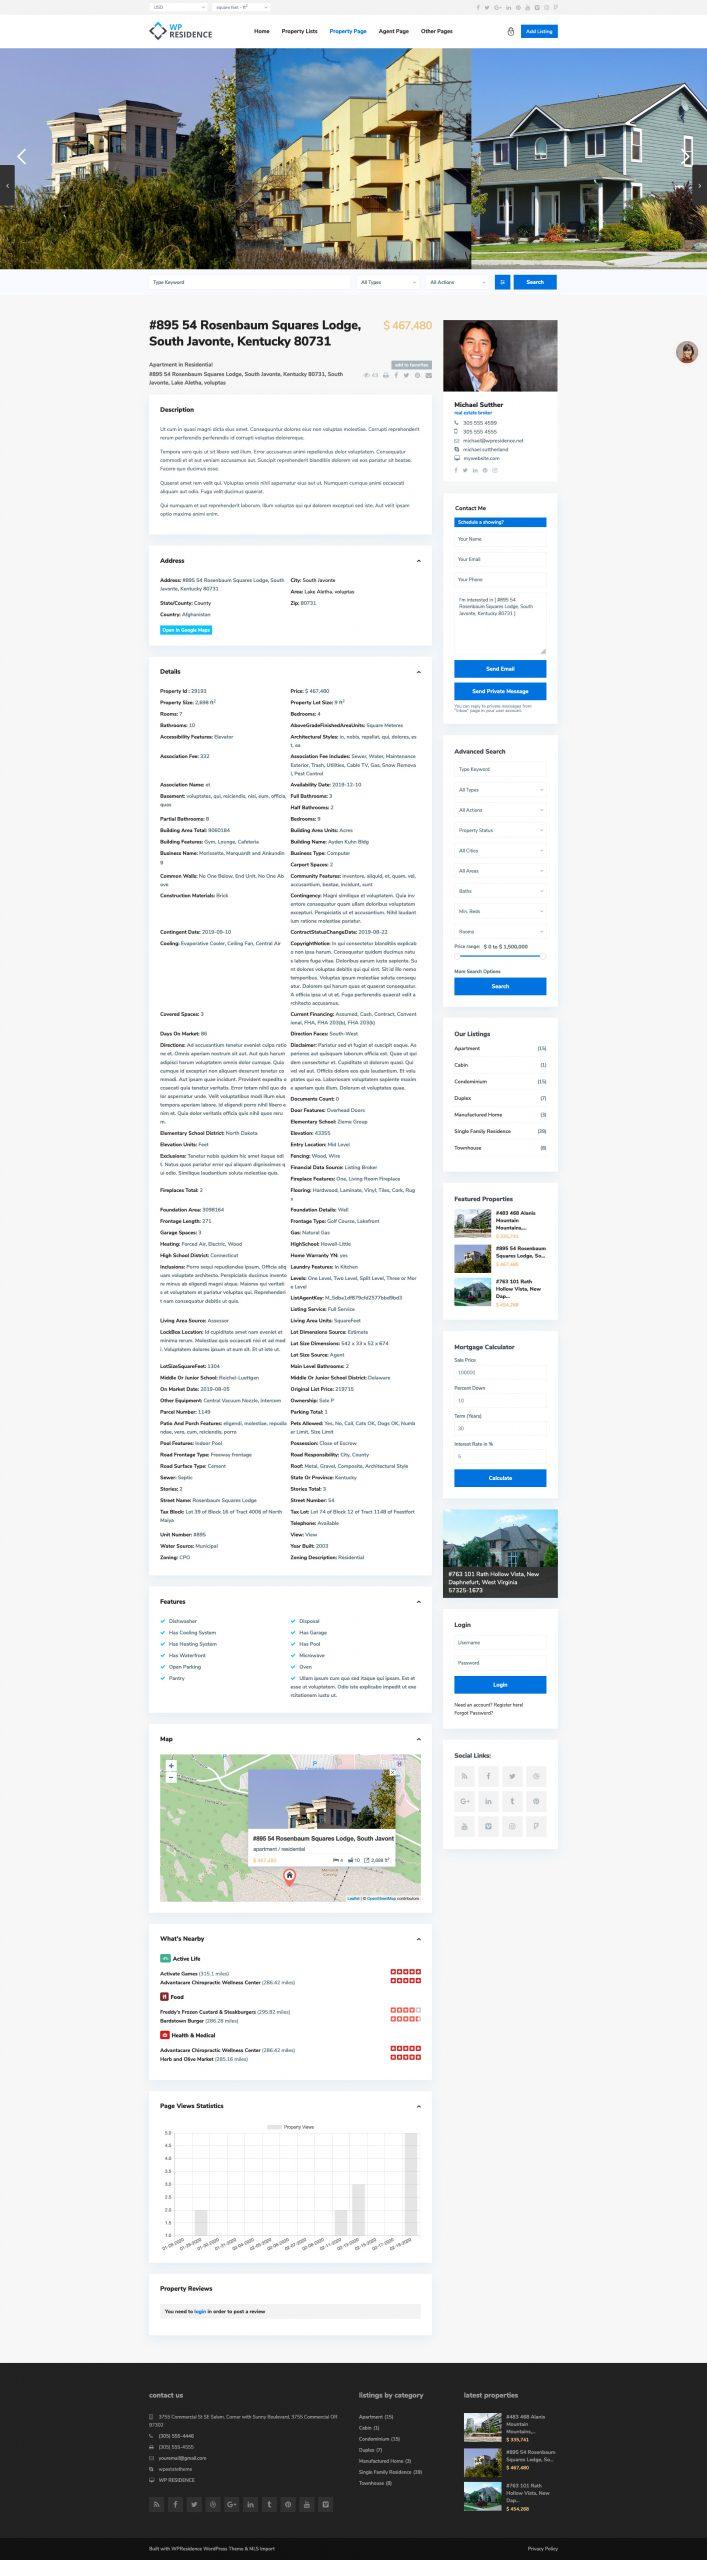 Ex of Organic Reso API Listing